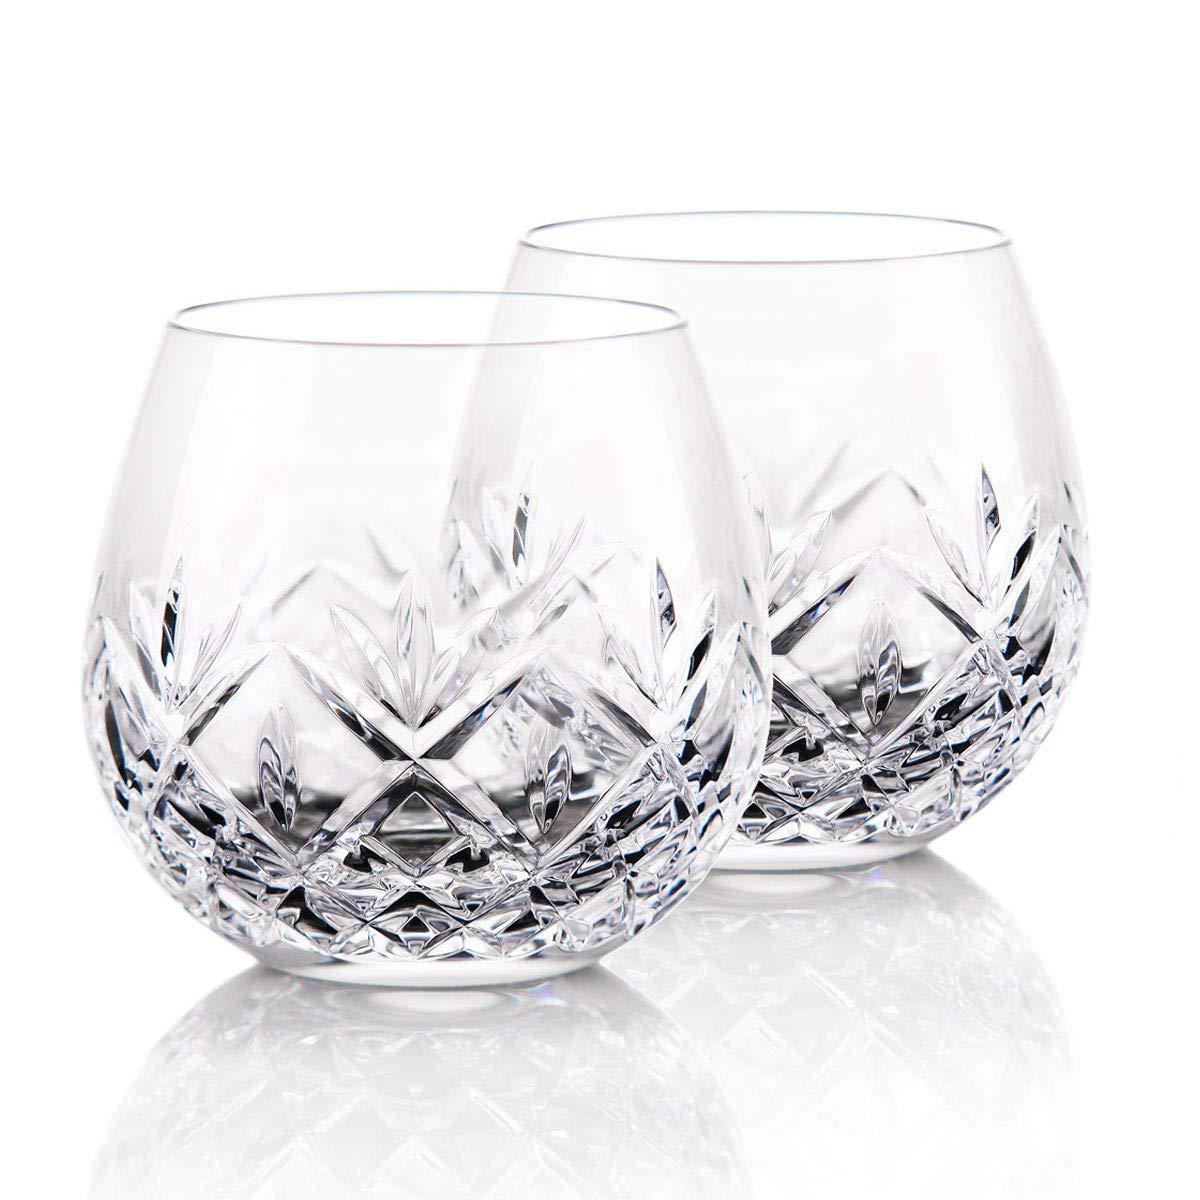 Waterford Crystal, Huntley Stemless Light Red, Pinot Noir Wine Glasses, Pair